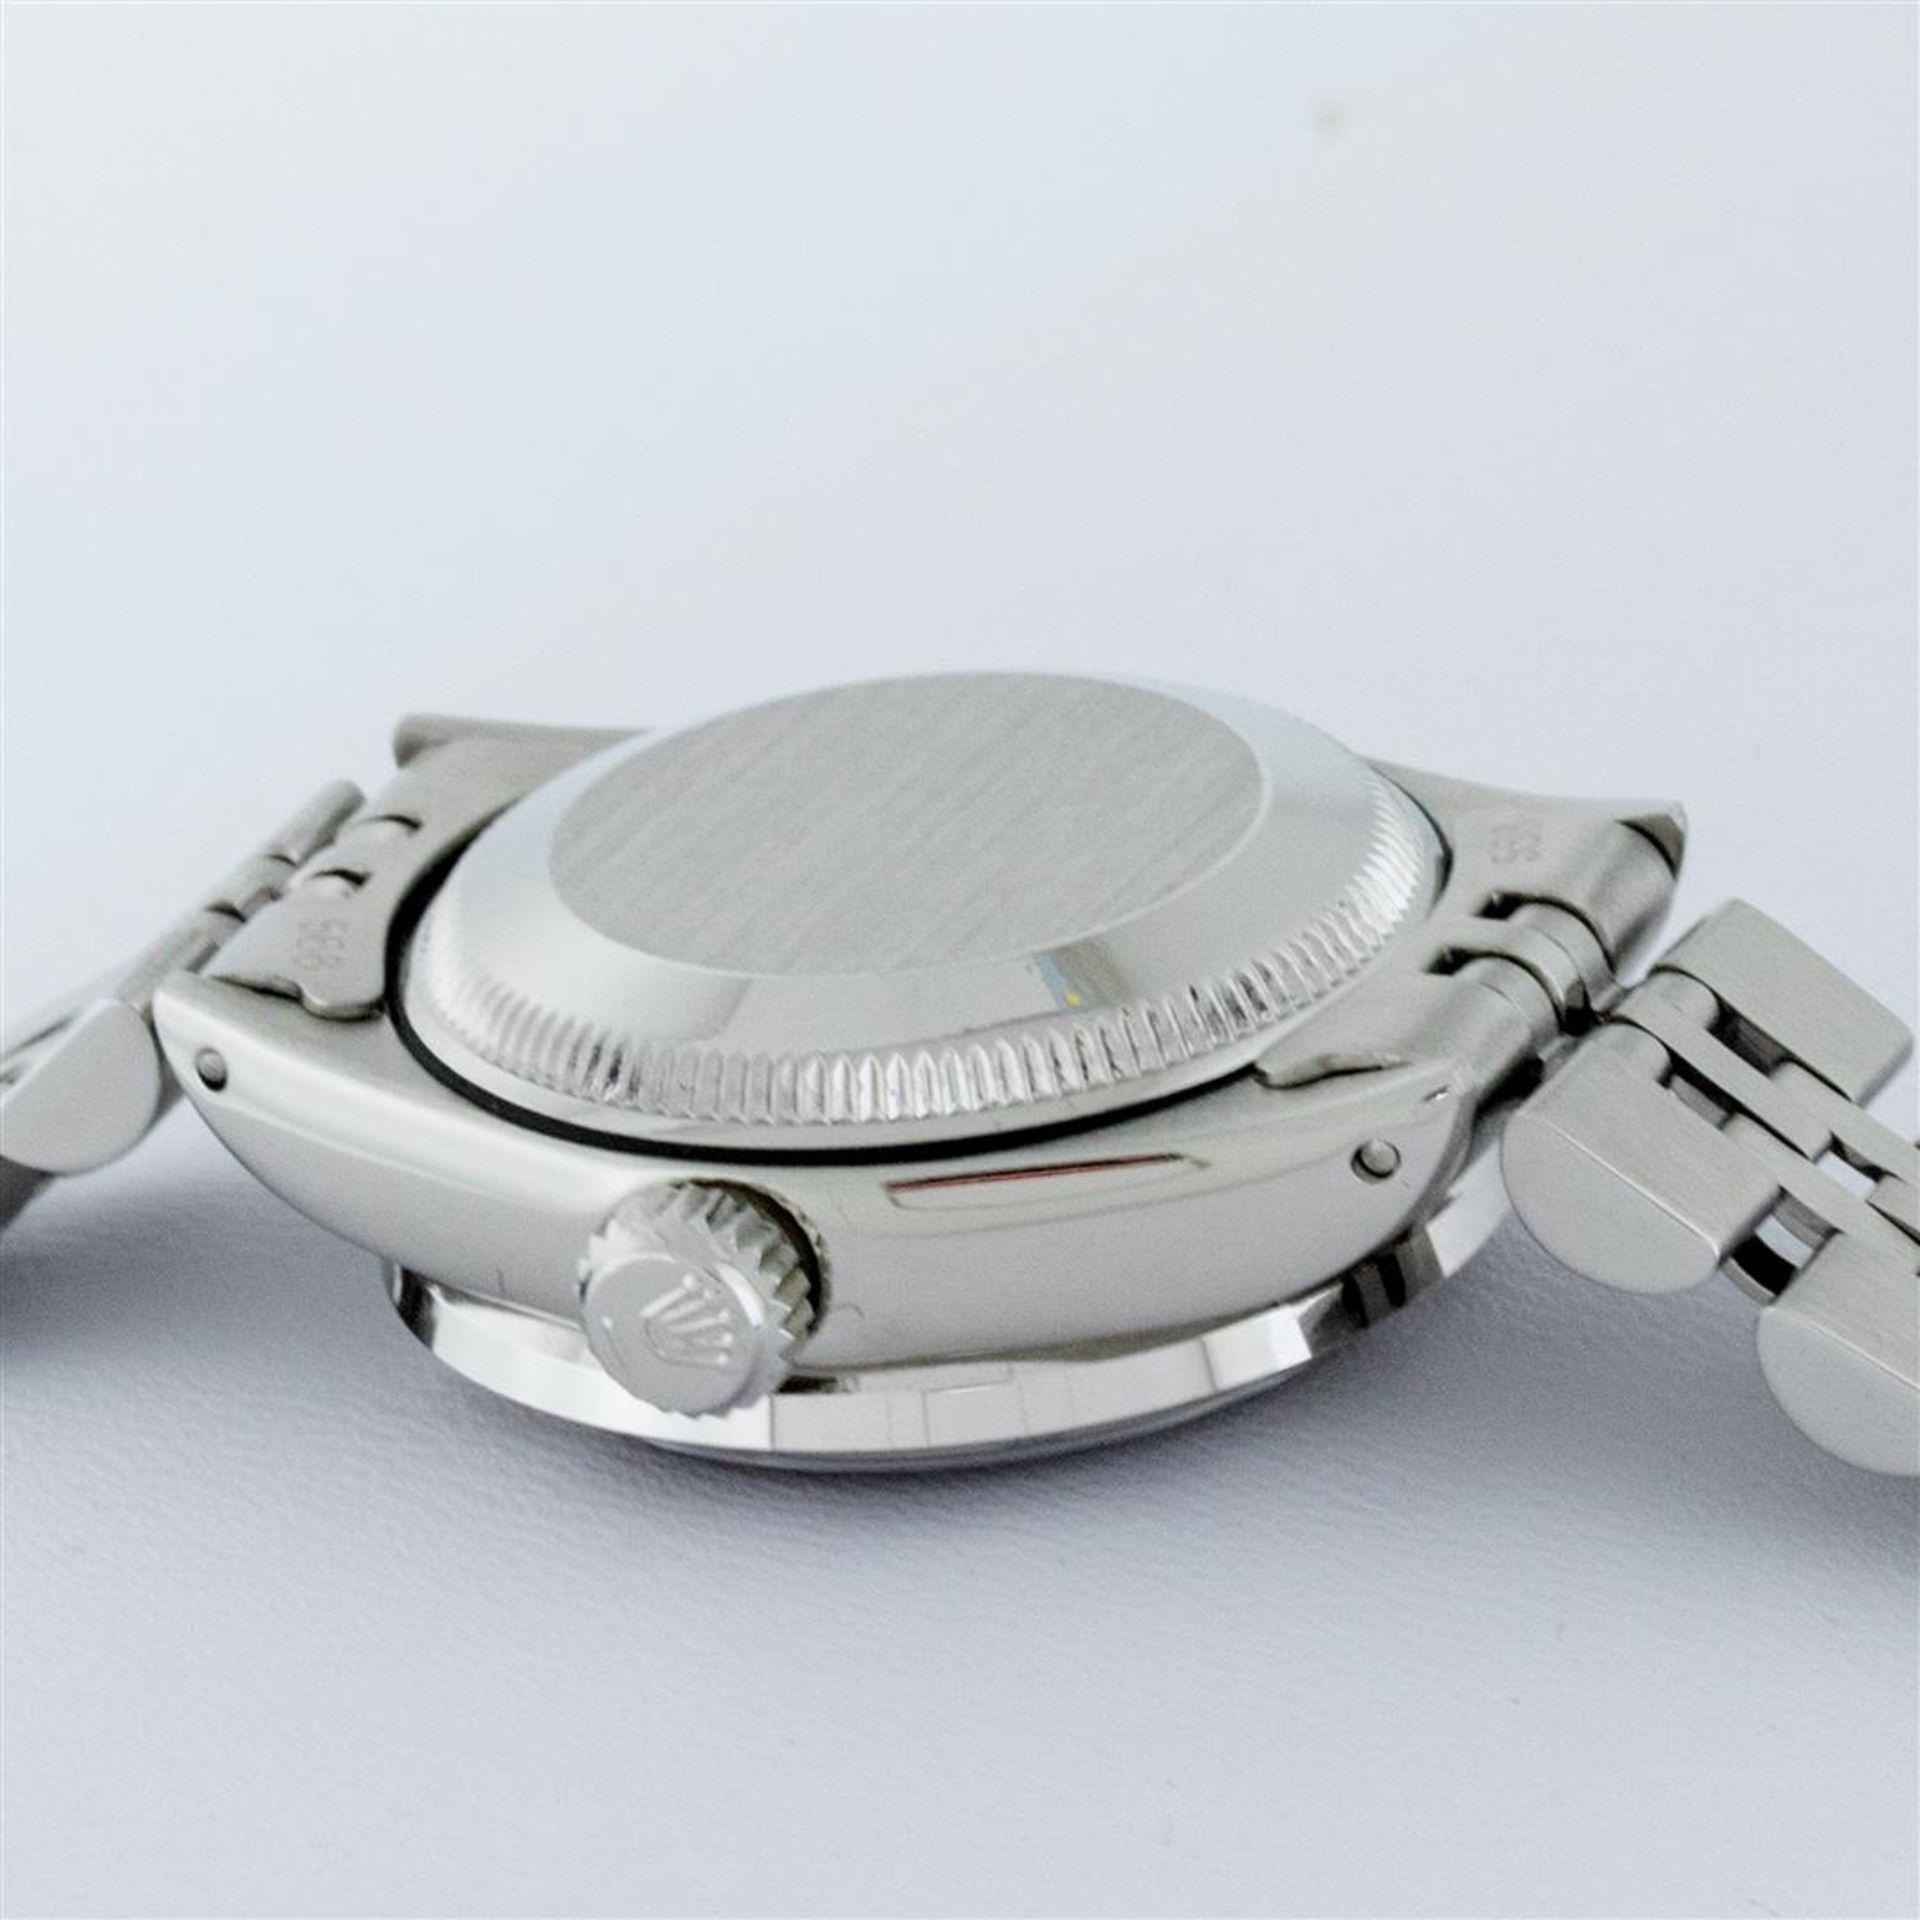 Rolex Ladies Stainless Steel Pink MOP Pyramid Diamond Datejust Wristwatch 26MM - Image 8 of 9